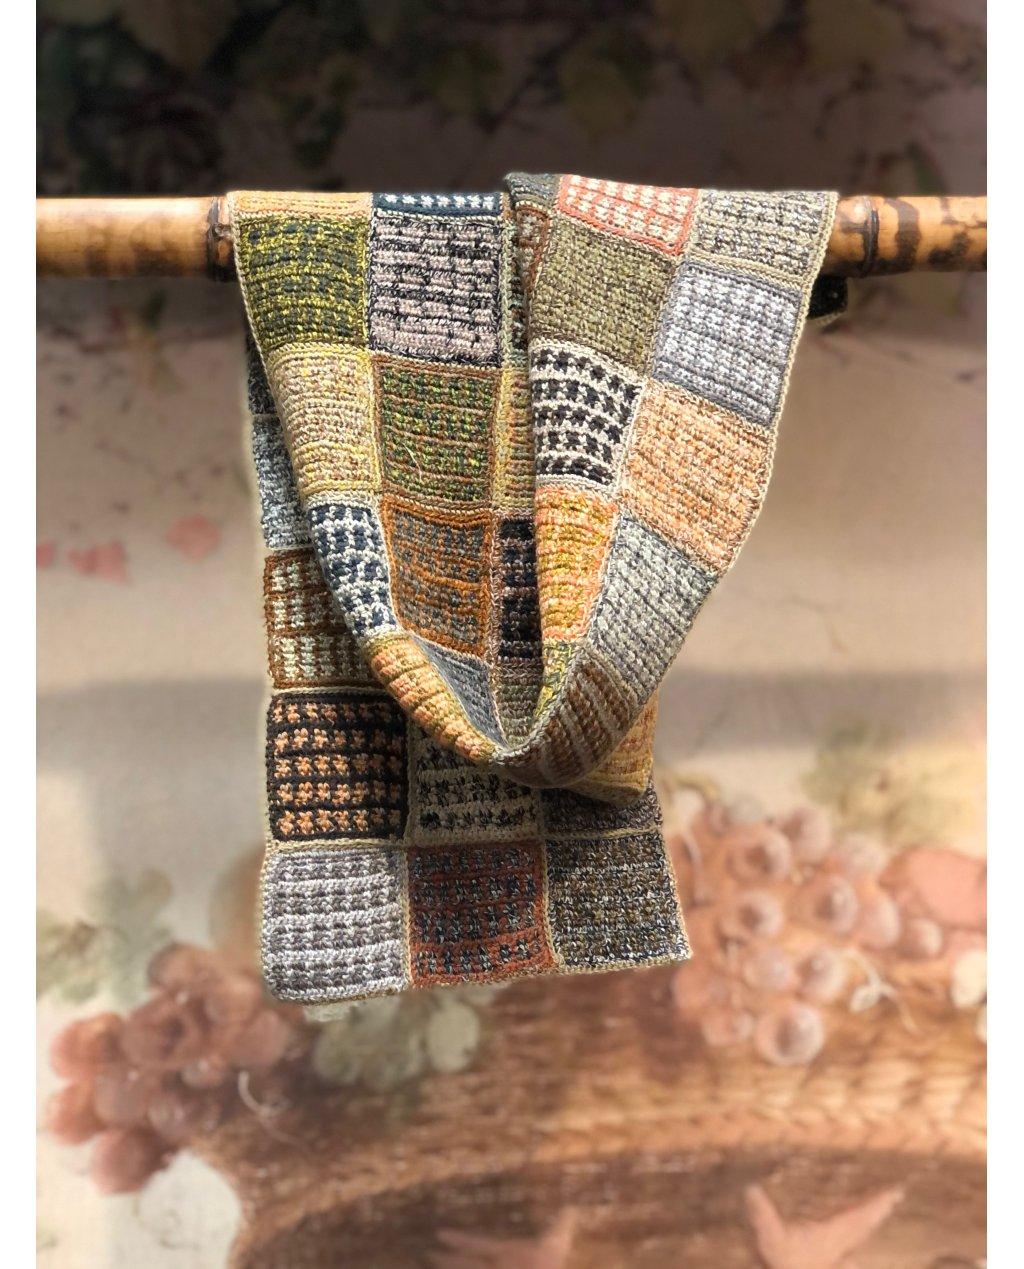 Sophie Digard   Esprit Voyageur   Small Crocheted Scarf   Merino